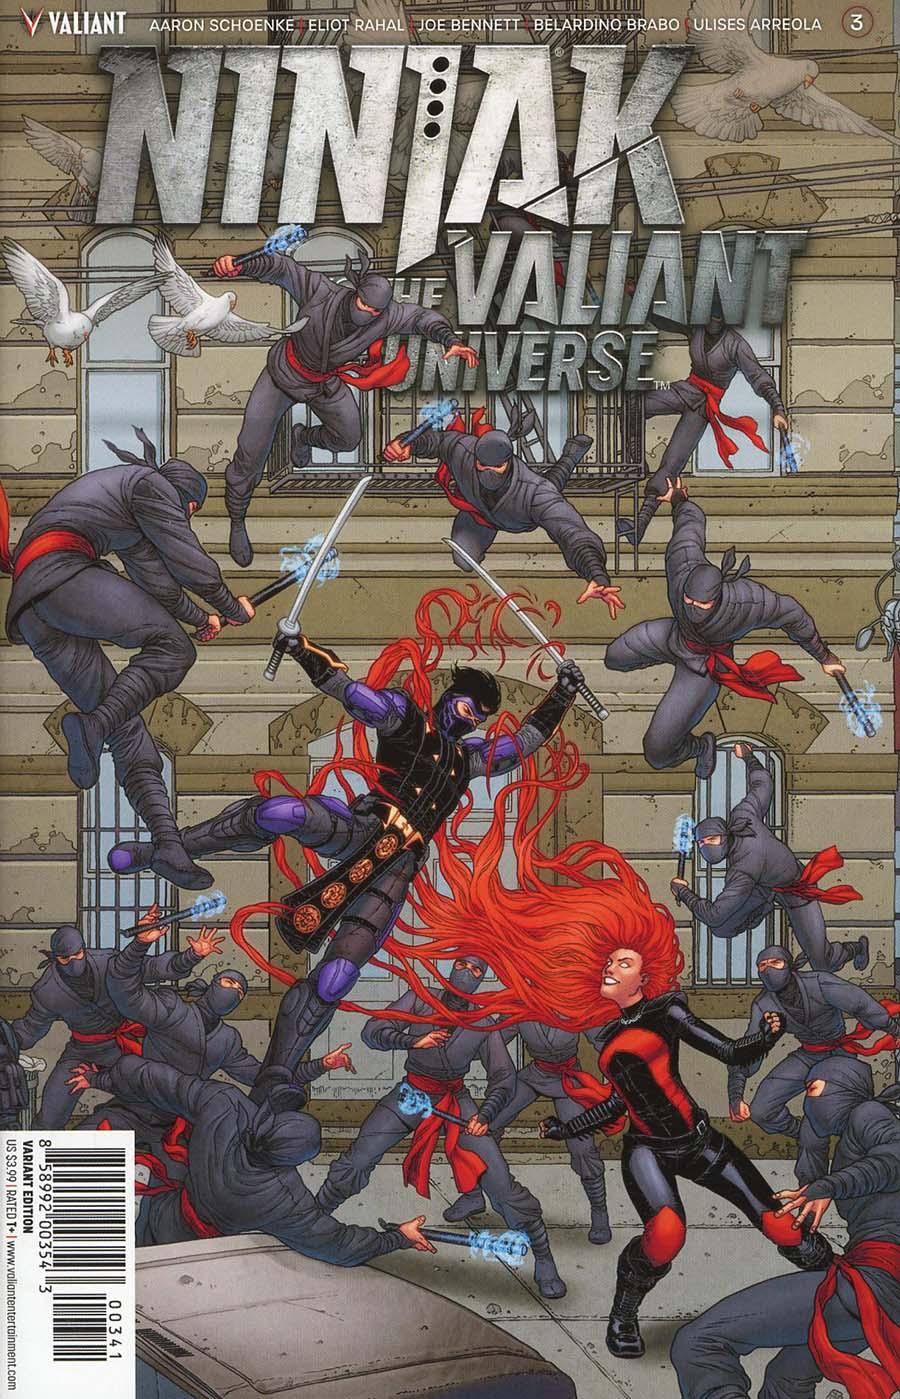 Ninjak vs The Valiant Universe #3 Cover D Incentive Francis Portela Interlocking Variant Cover